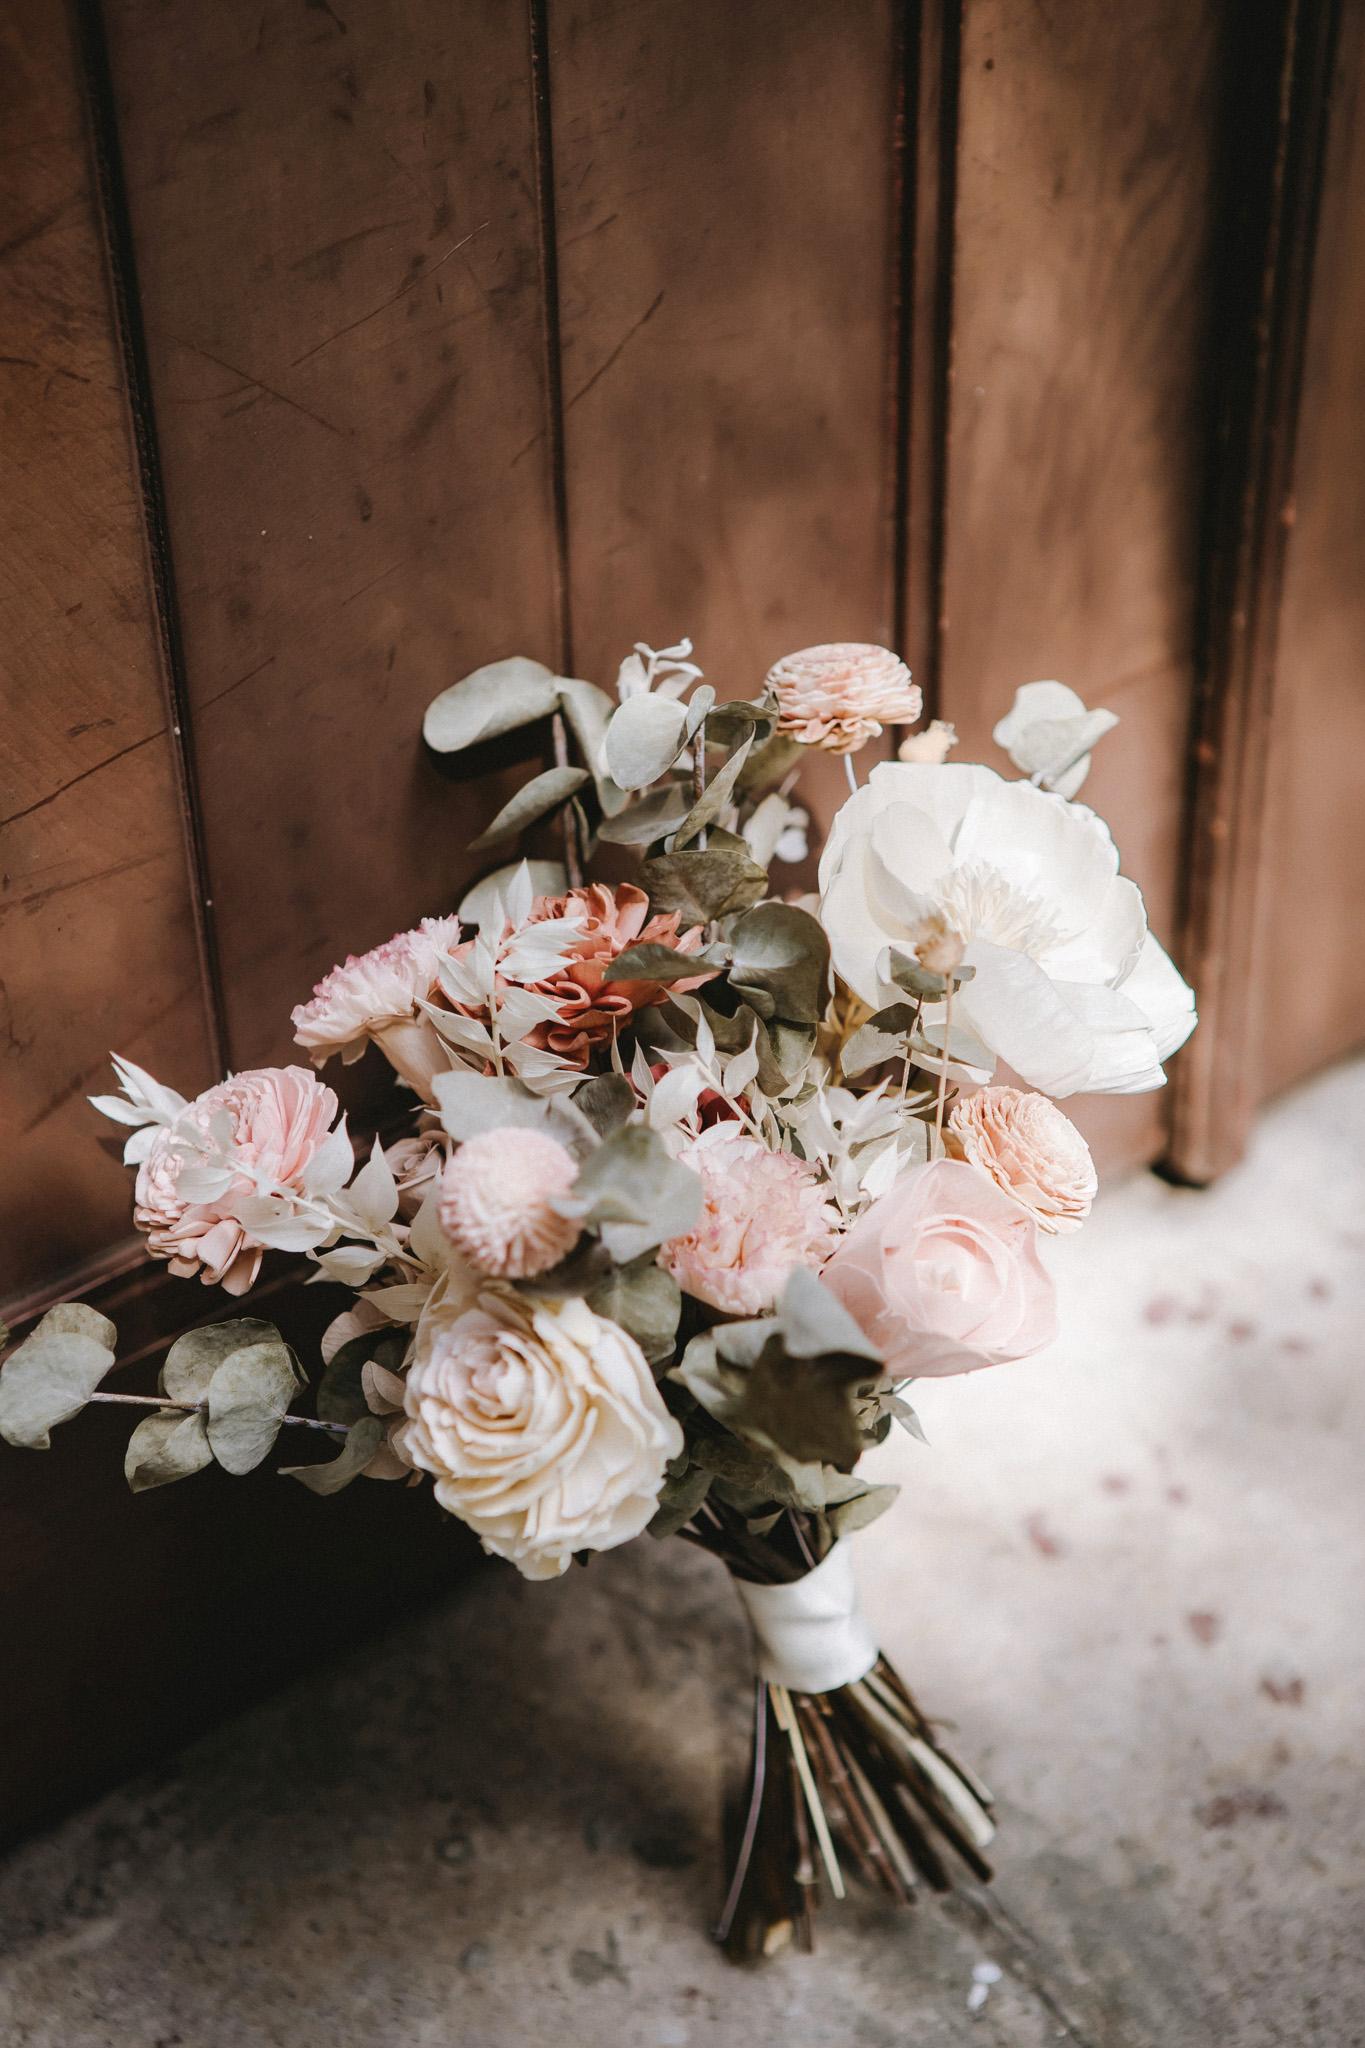 EW 台北婚攝 居米 濟南教會 Brick Yard 33 美軍俱樂部 婚禮 婚宴-5